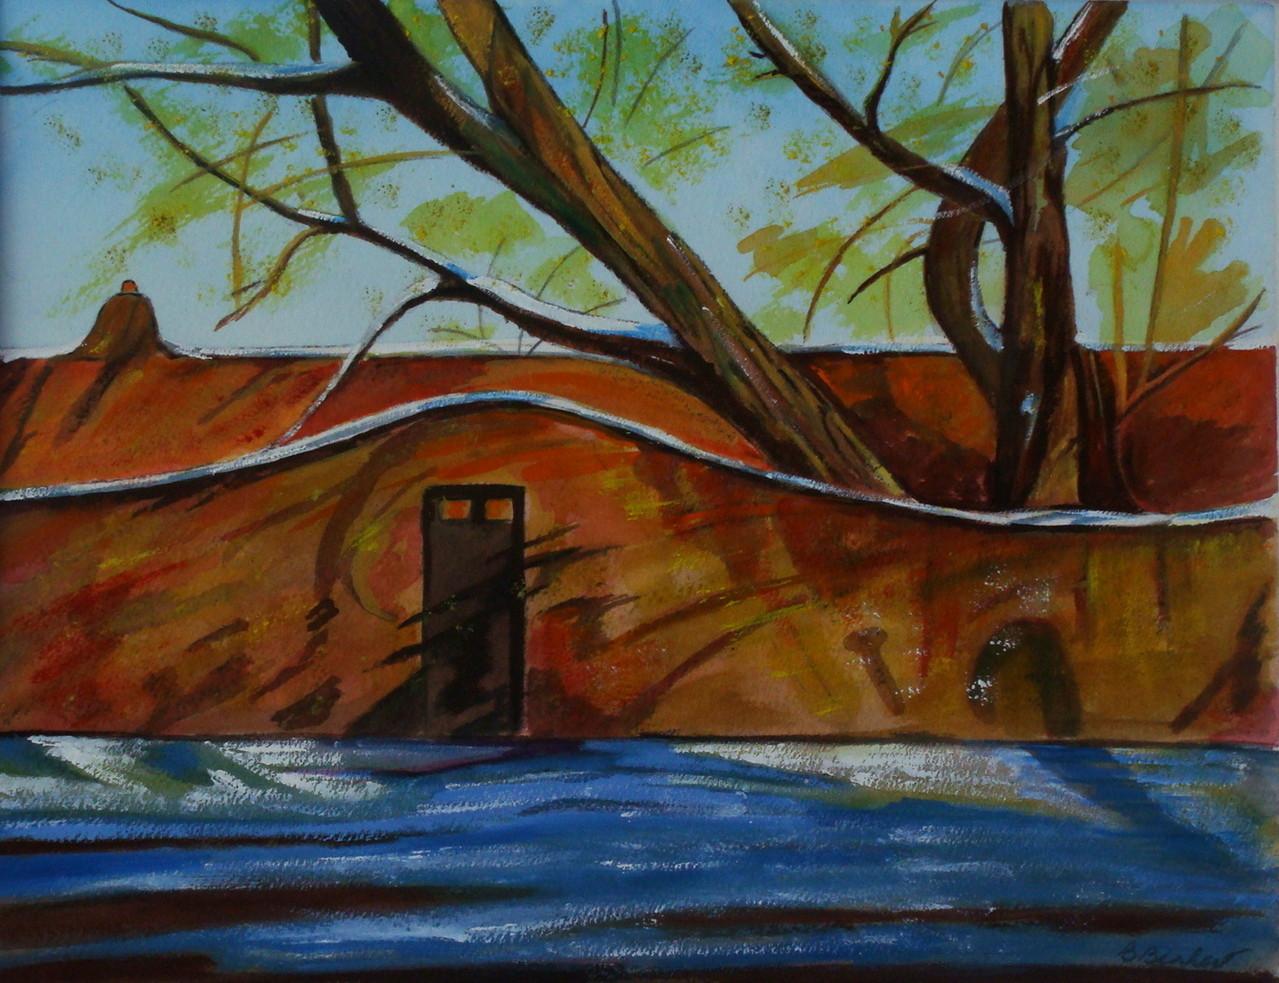 Garden Wall, watercolor, 13.5 x 10.5 SOLD